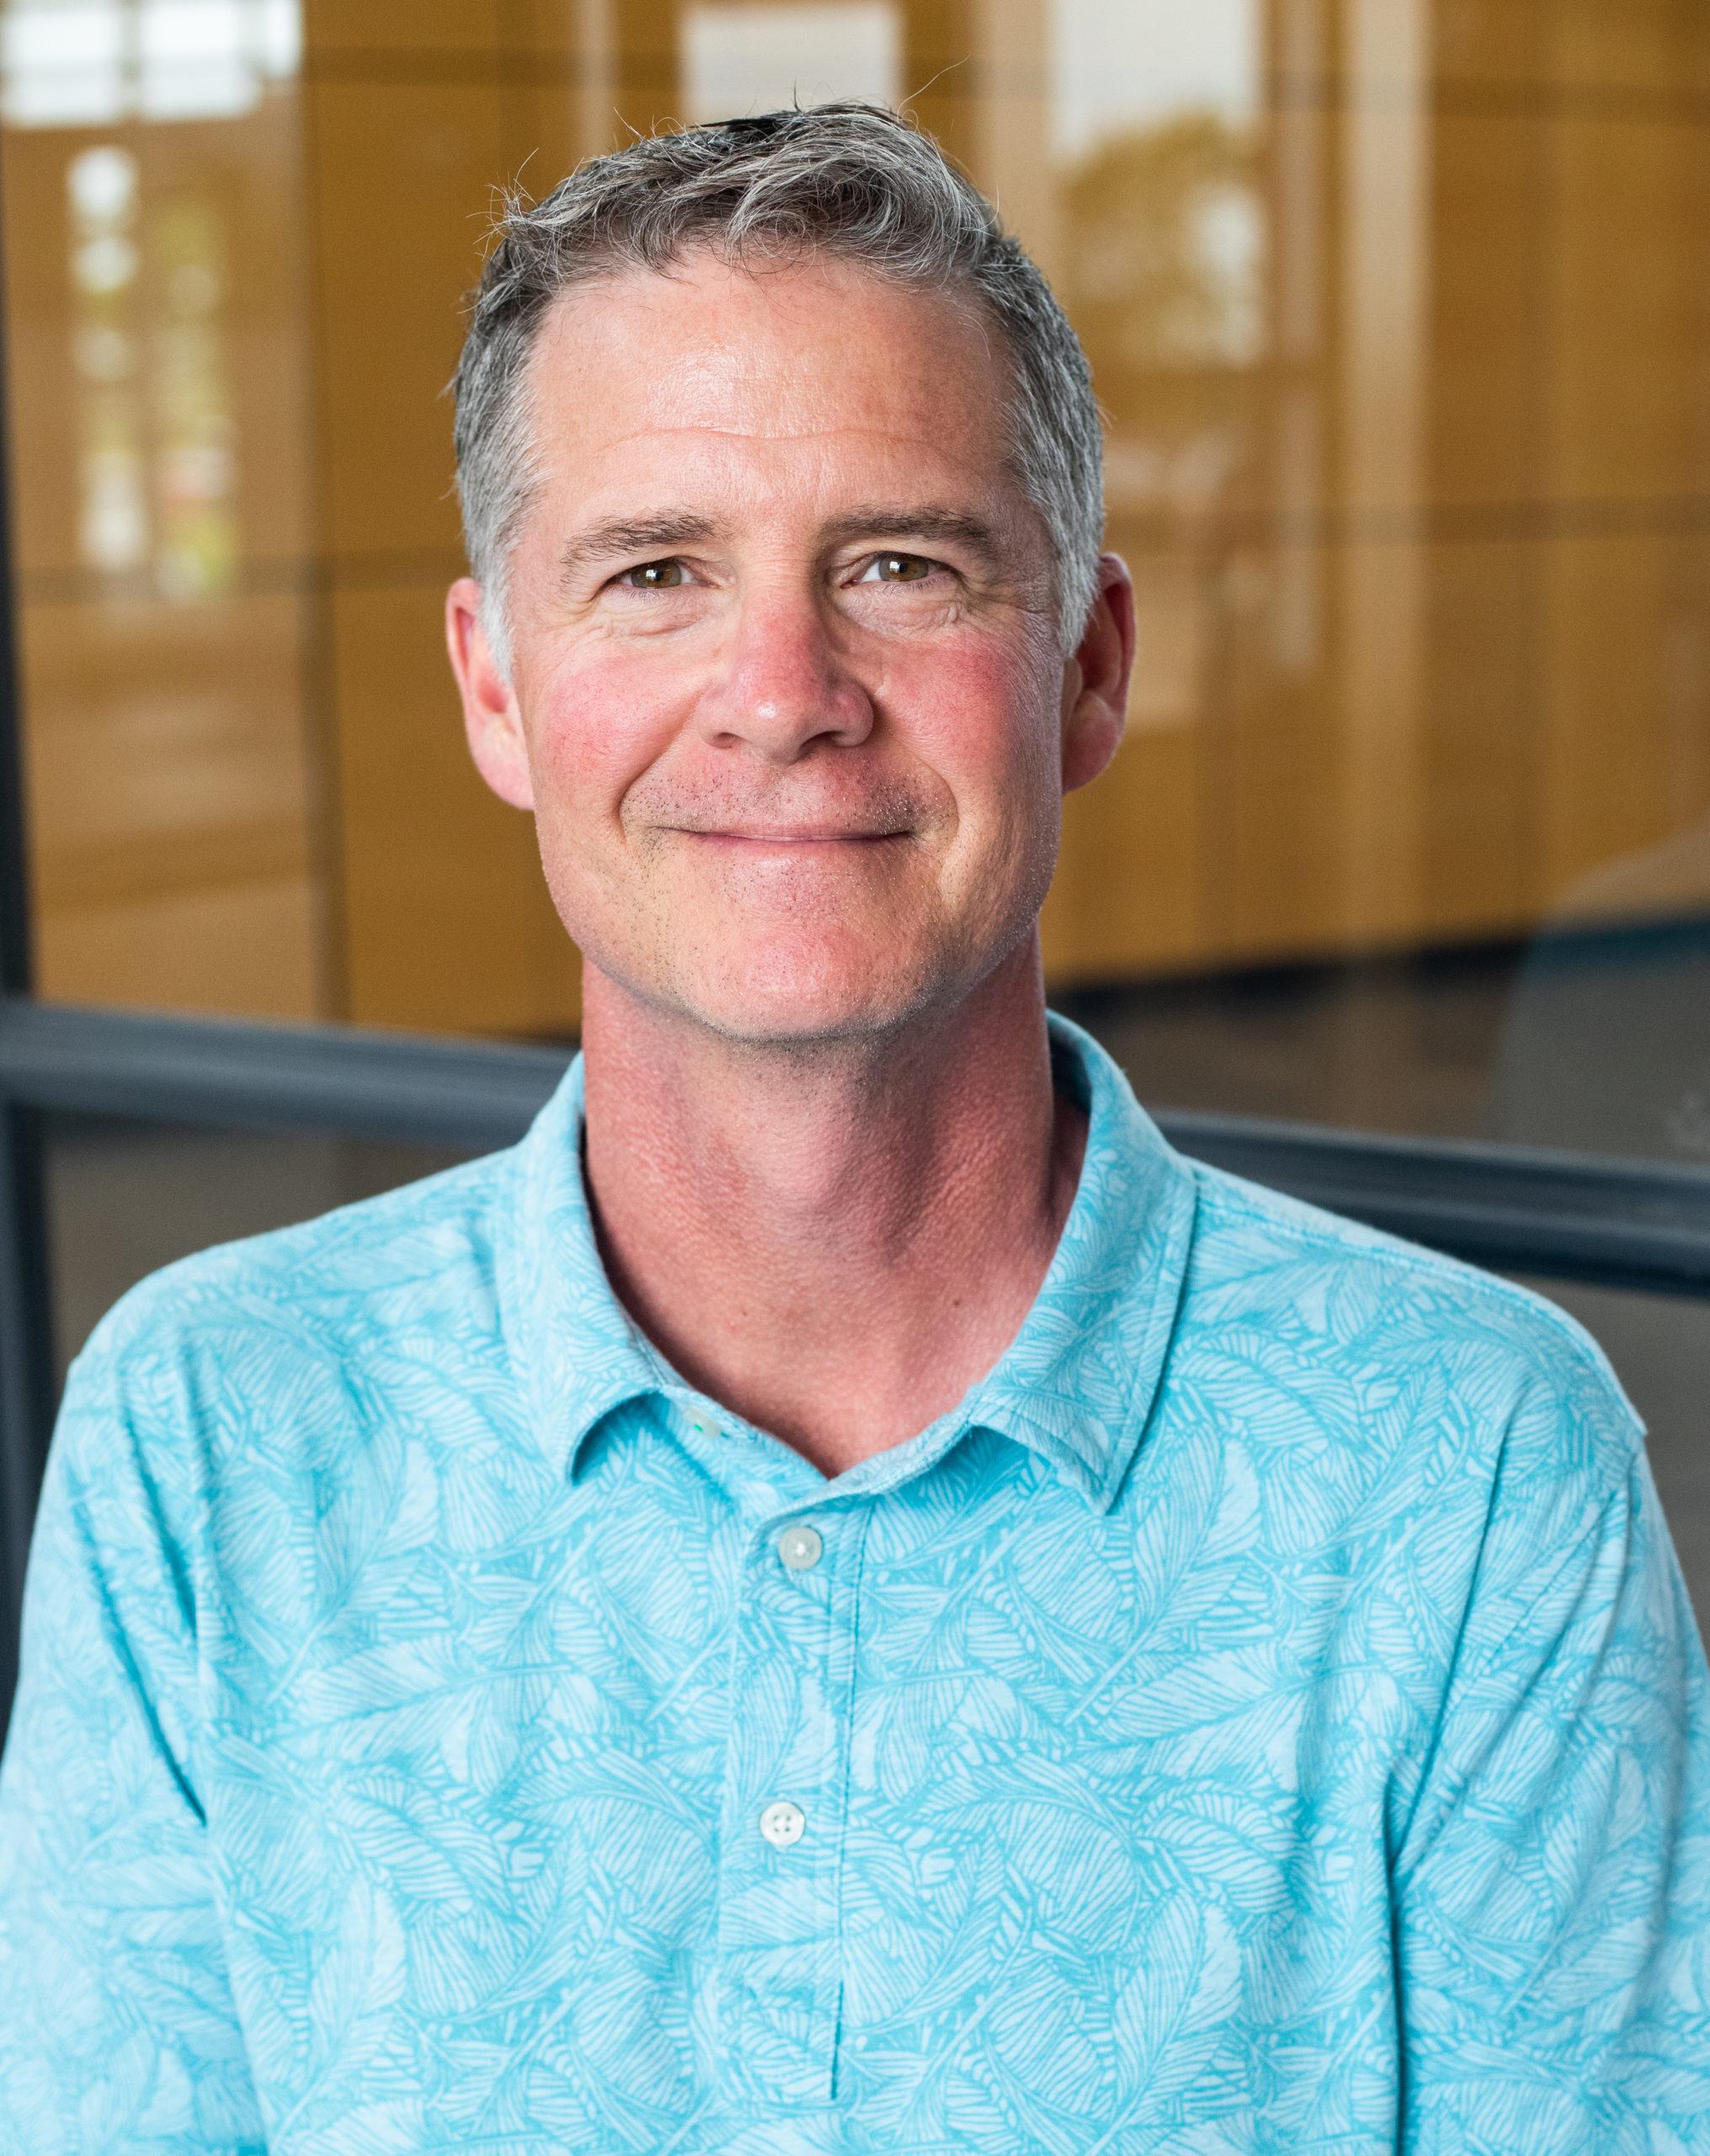 Scott Roth